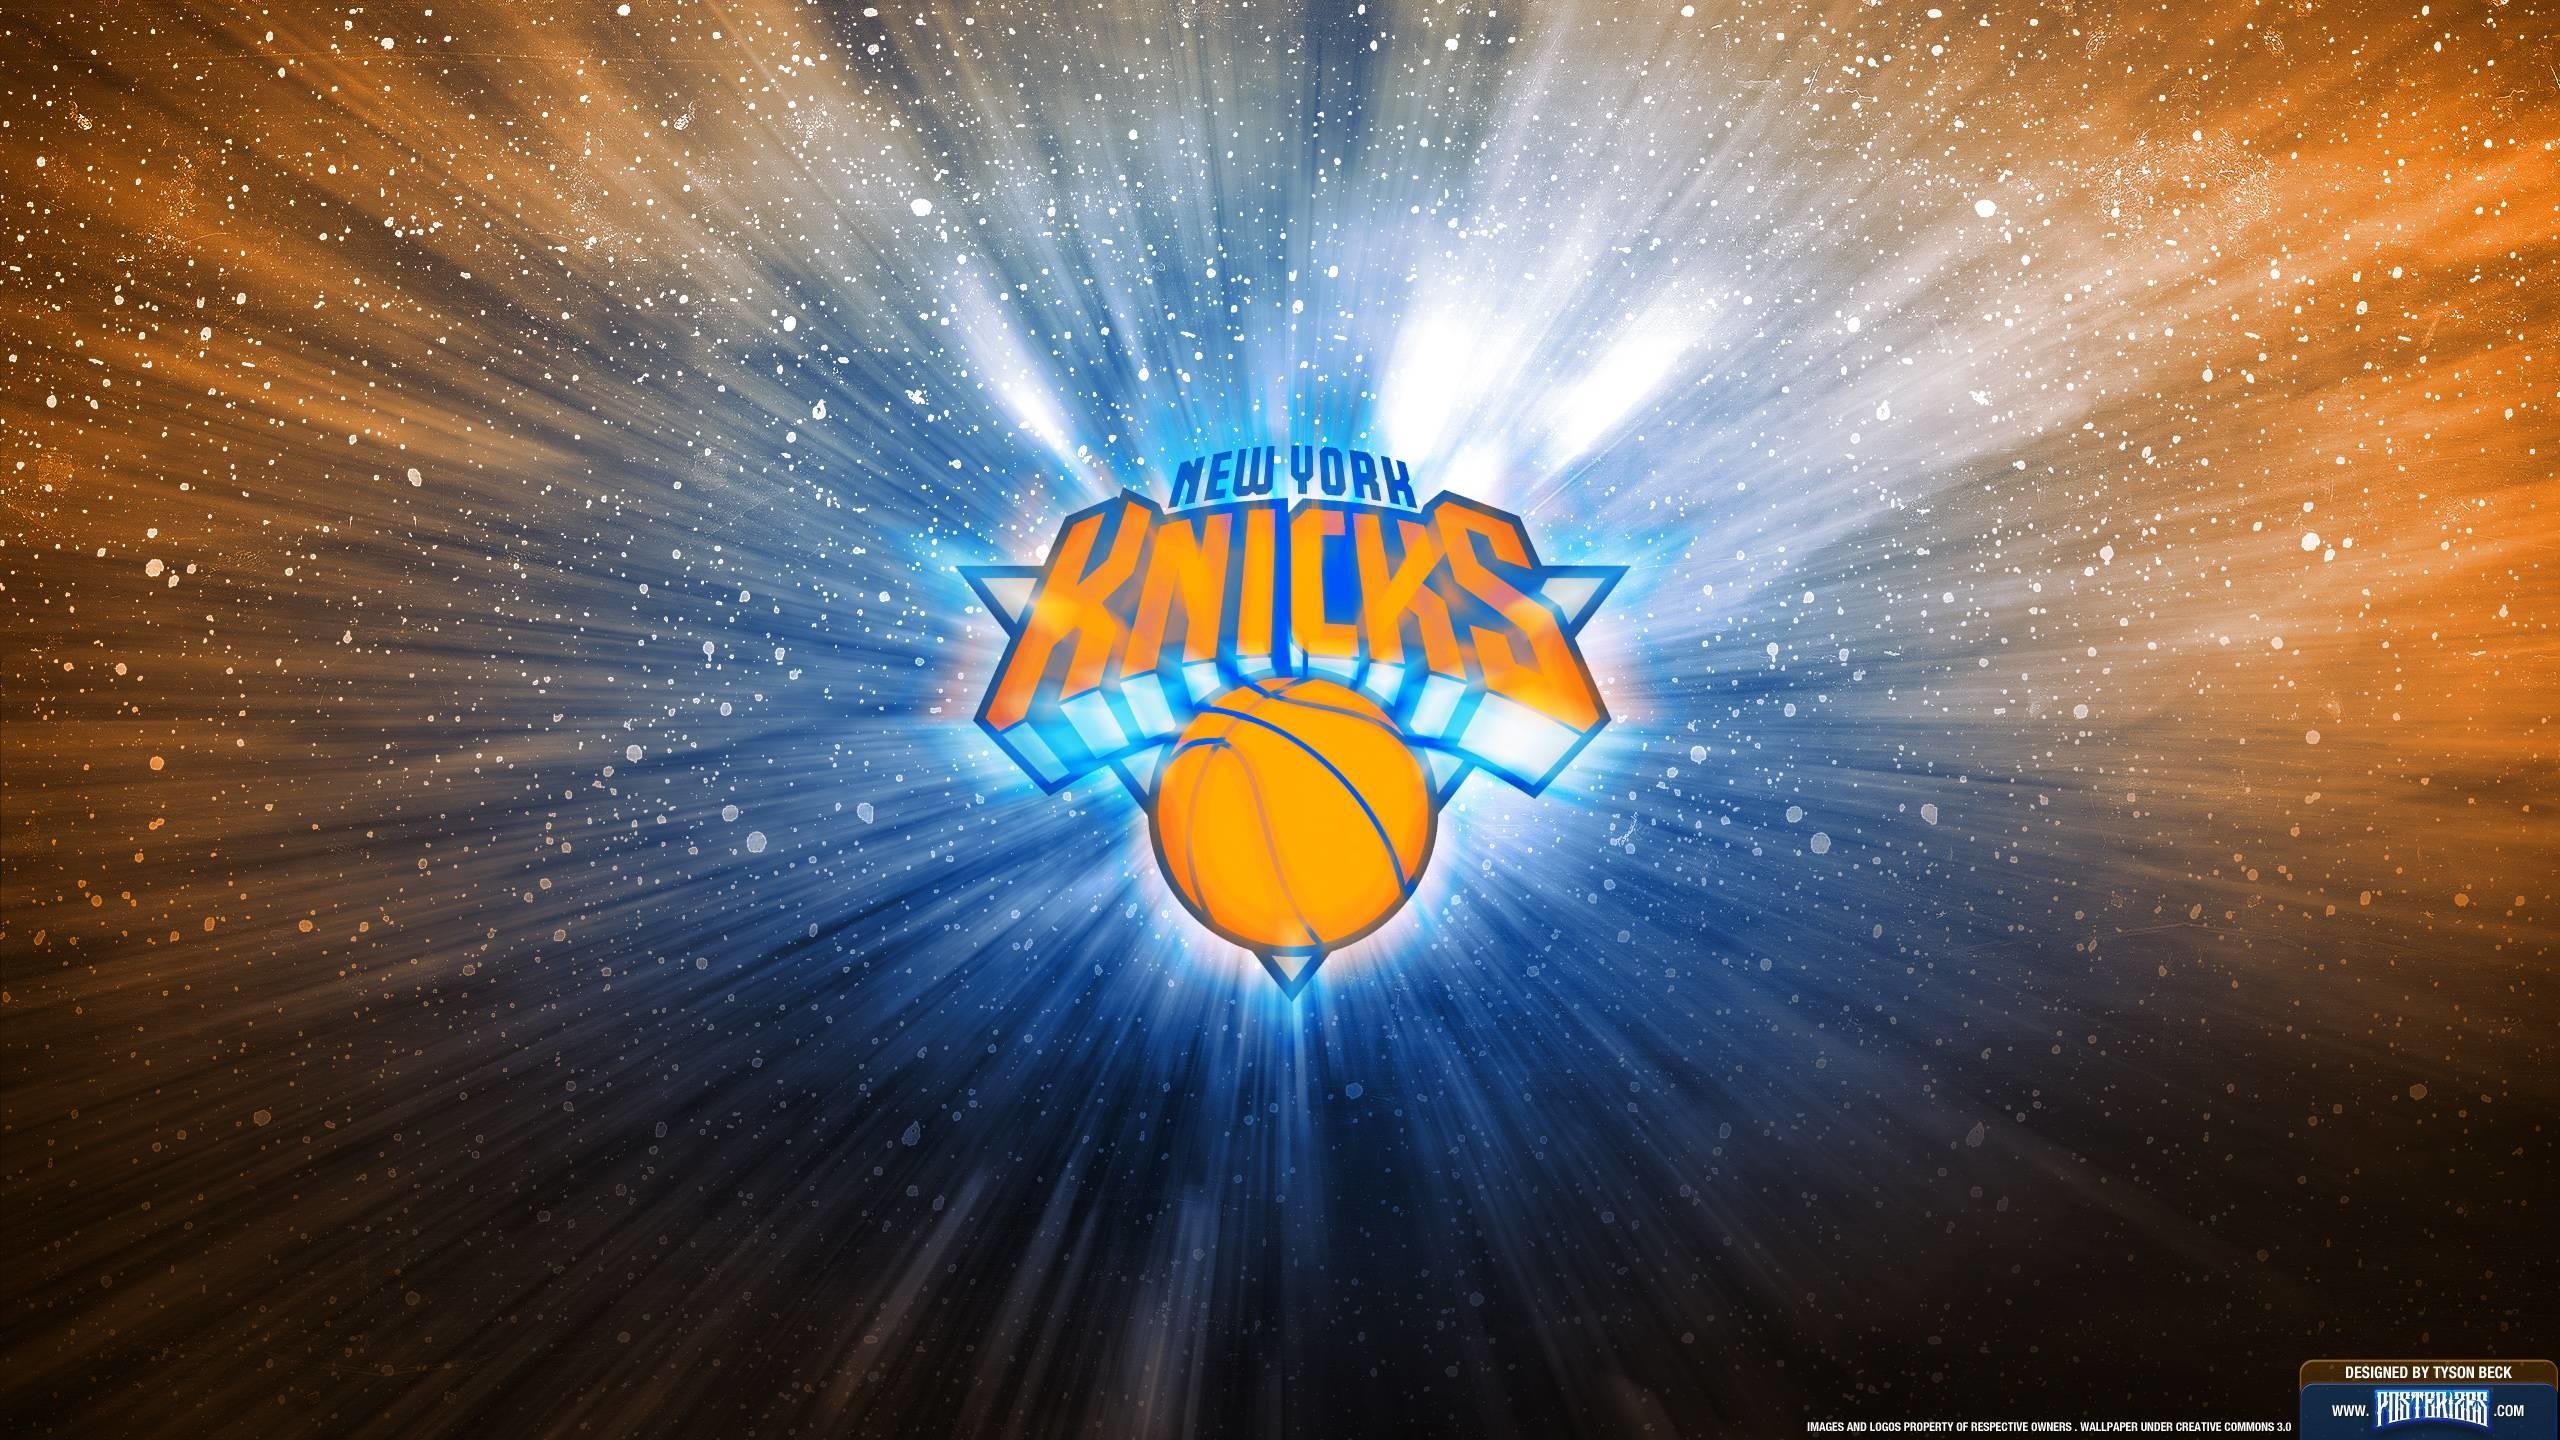 Res: 2560x1440, New York Knicks | Posterizes | NBA Wallpapers & Basketball Designs .